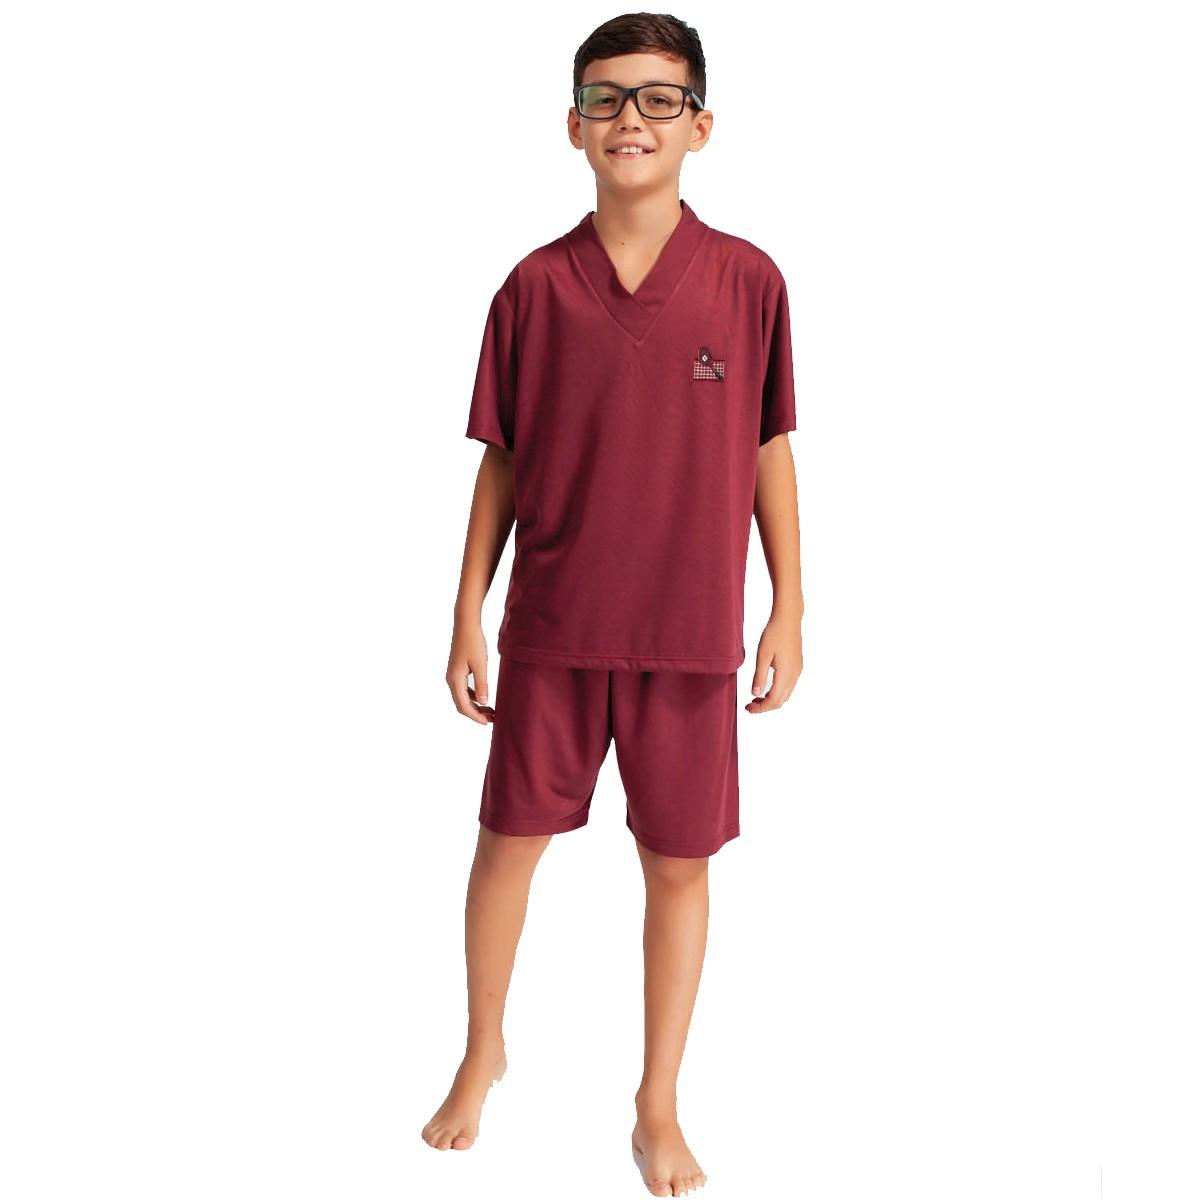 Pijama Meia Manga Short Malha Masculino Infantil Estampado Ref: 1423